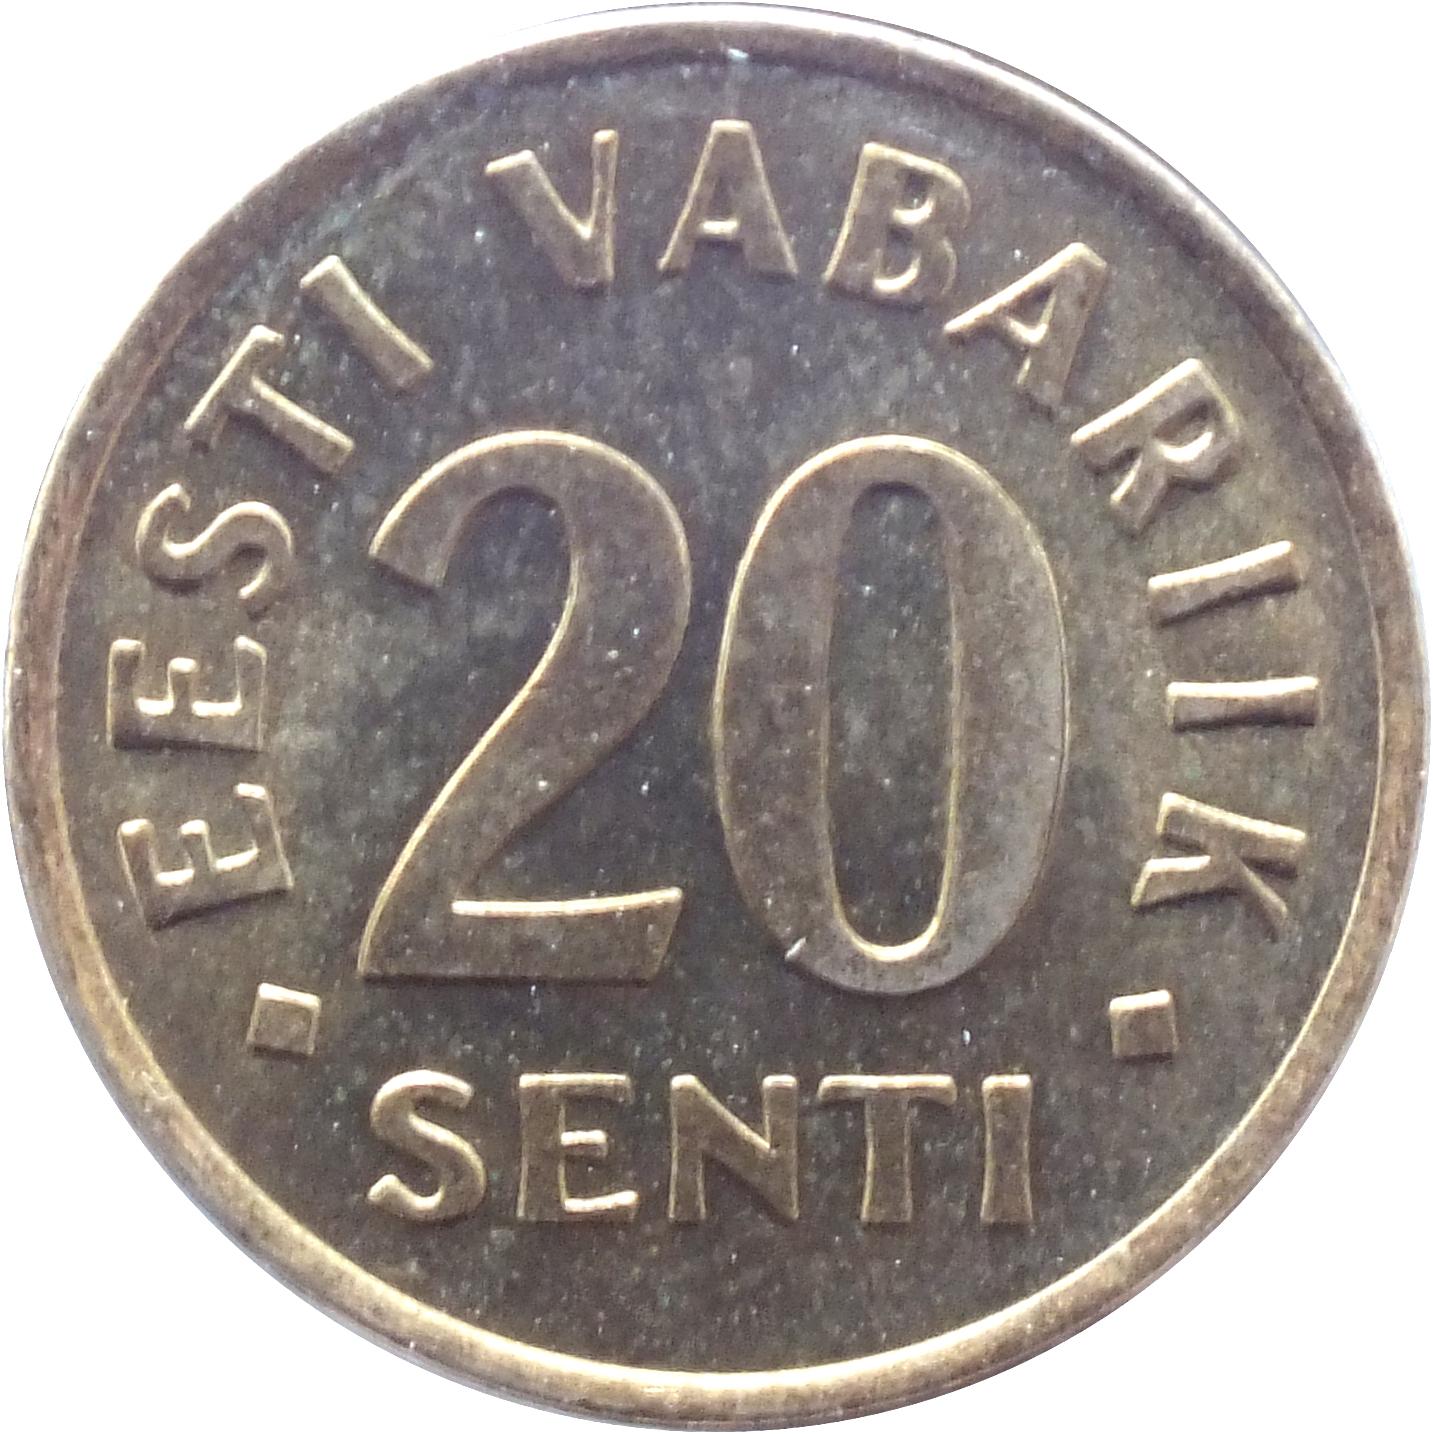 Eesti vabariik 20 senti 1996 2 копейки 1958